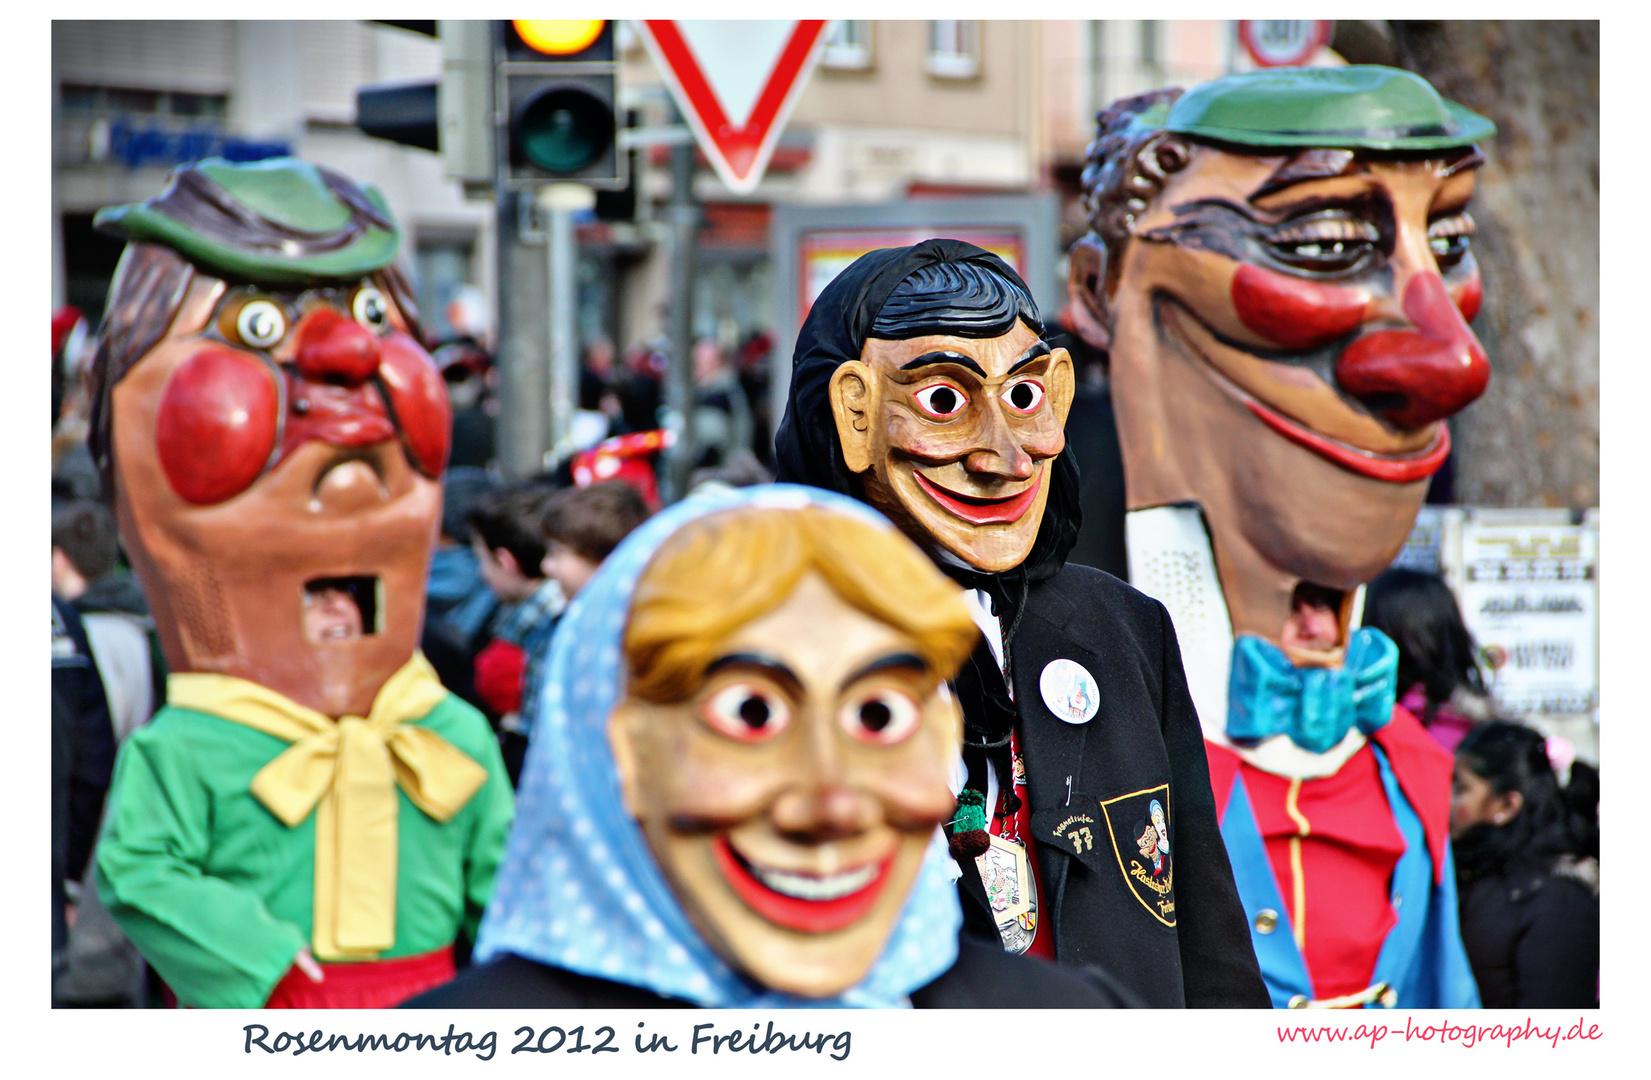 Rosenmontag in Freiburg 2012 - 1